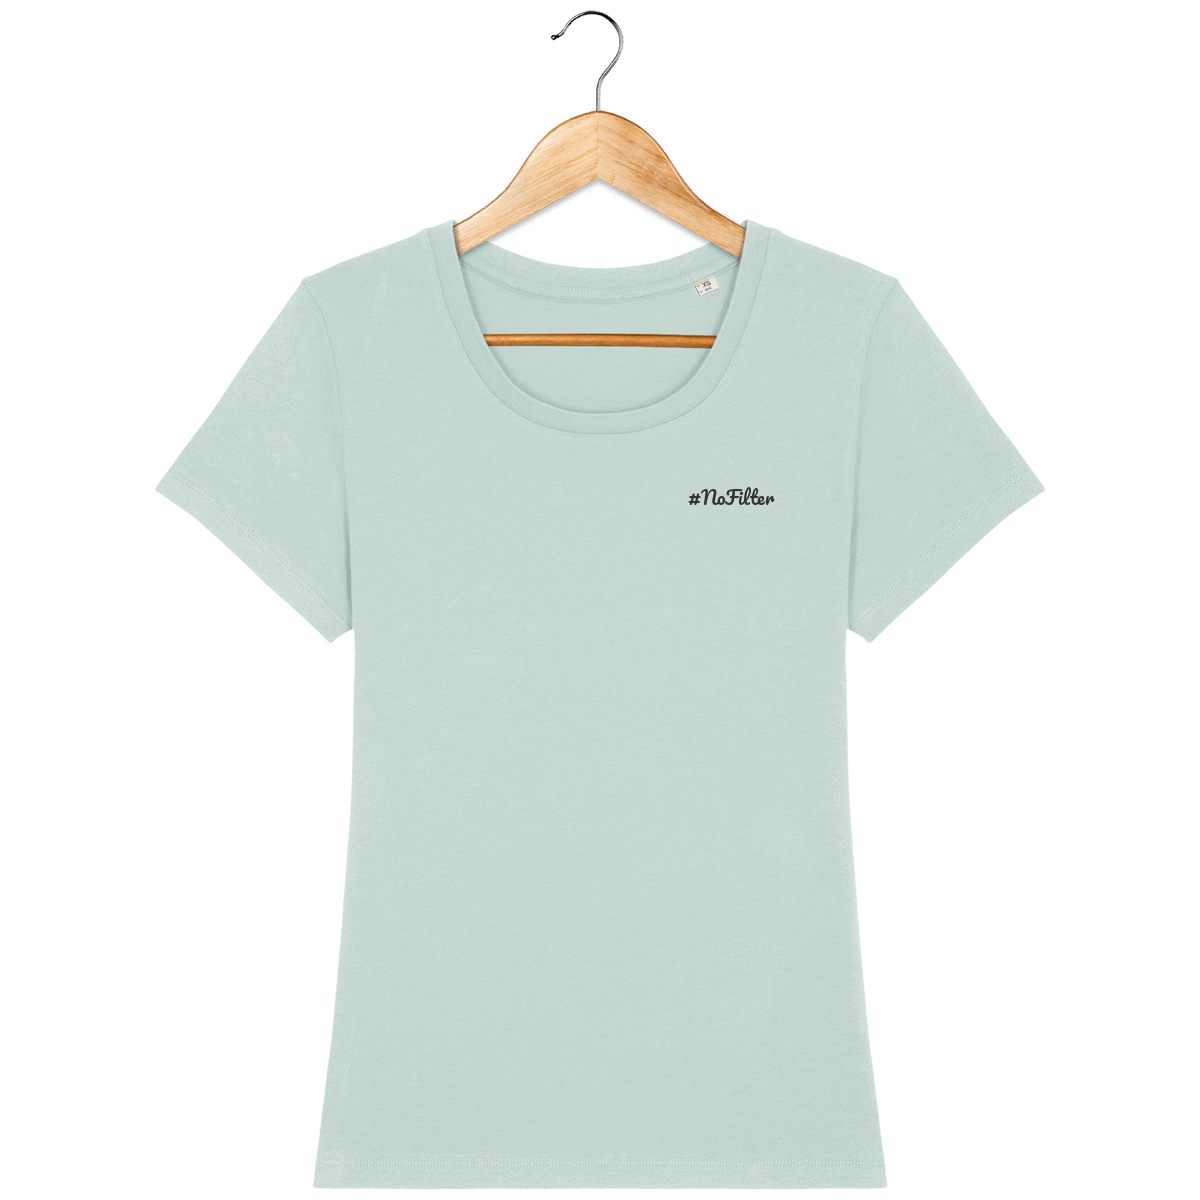 t-shirt-bio-brode-nofilter-caribbeanblue-darkgrey_caribbean-blue_face